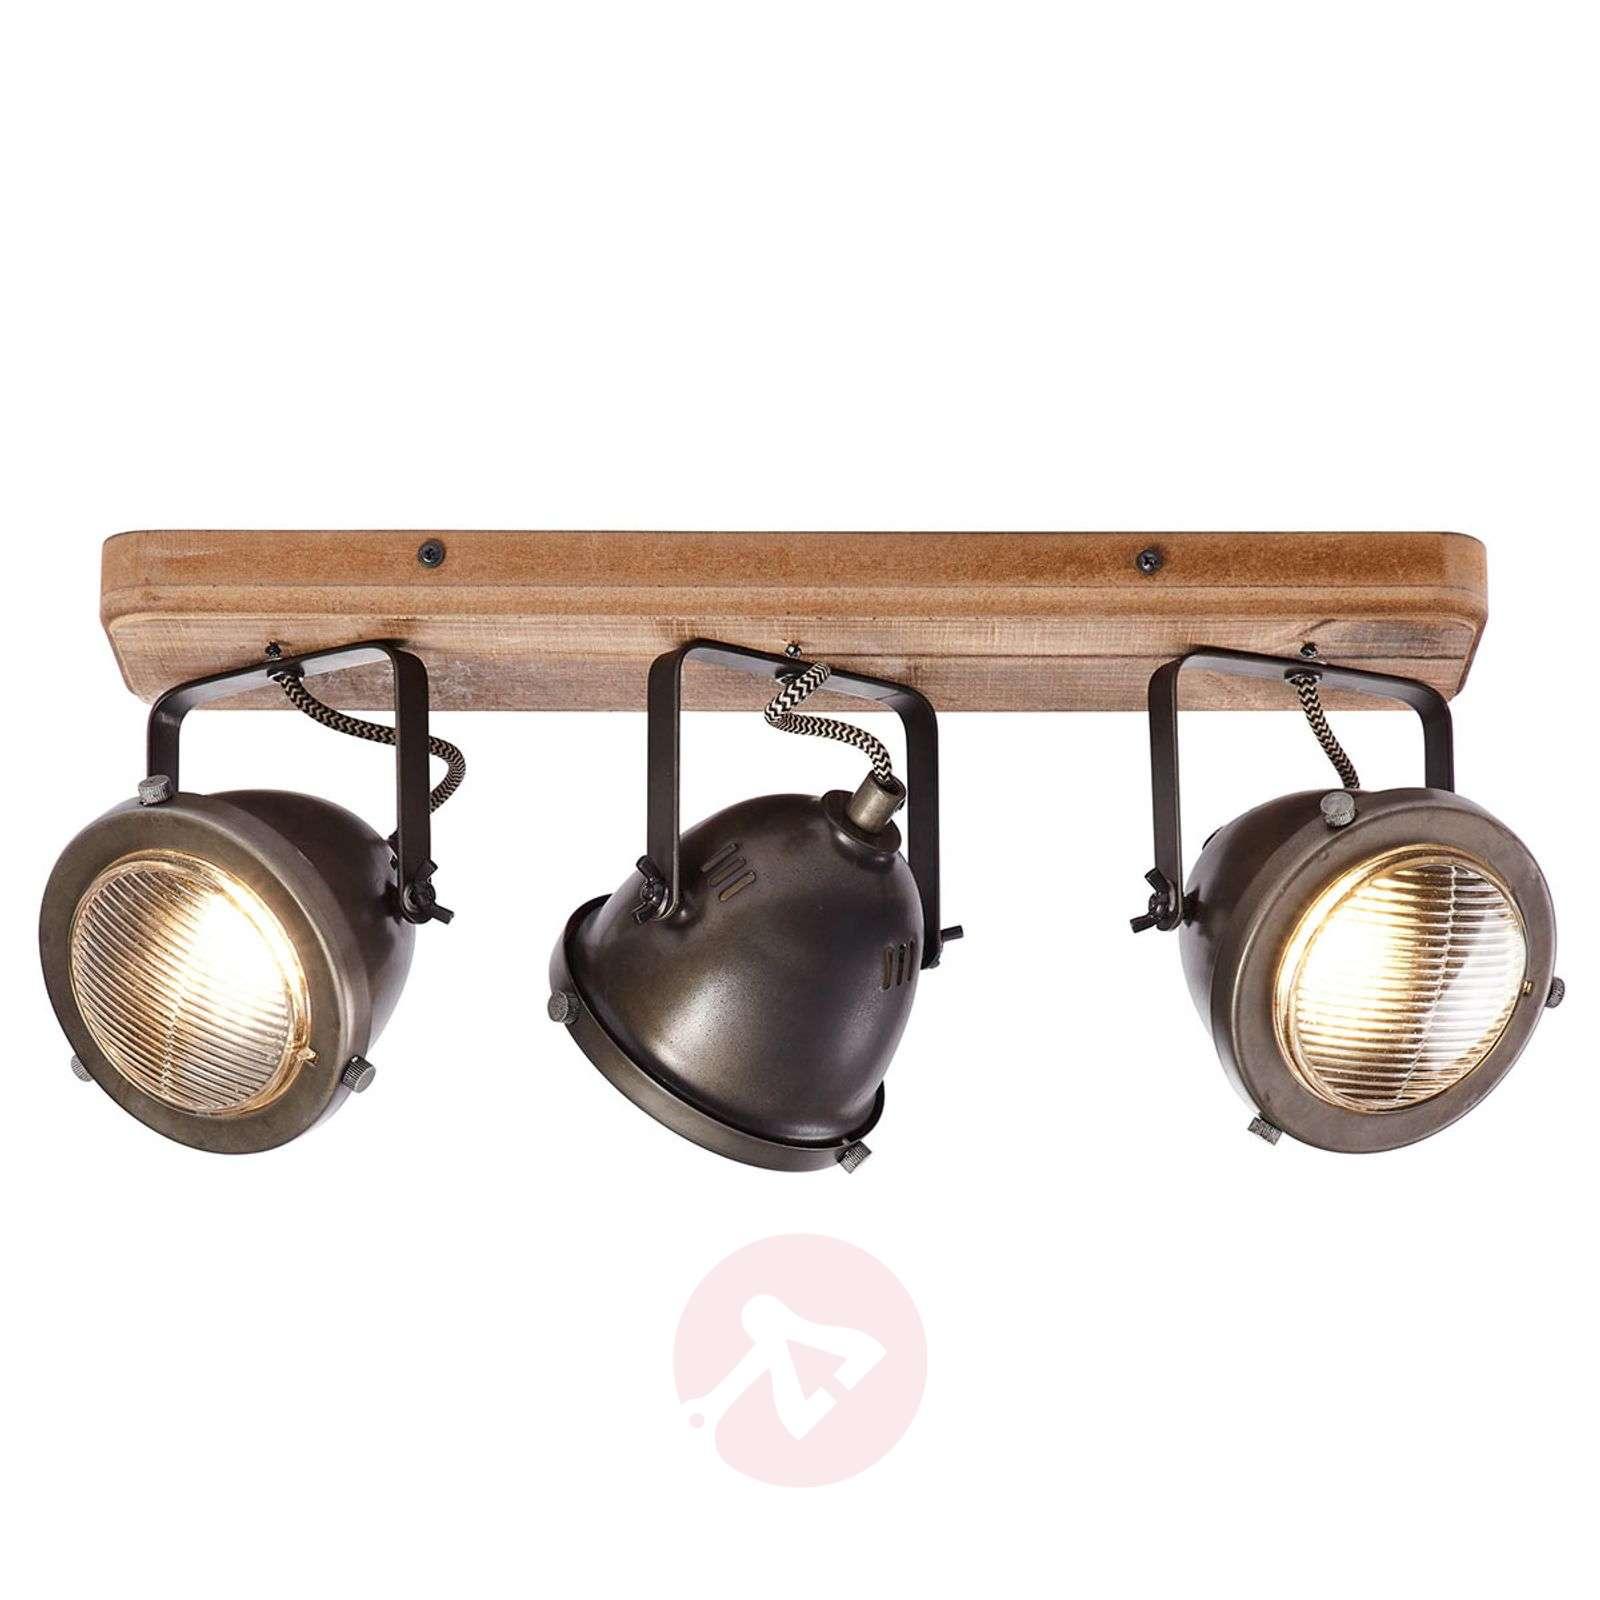 Kattolamppu Carmen Wood industrial-tyyli 3 lamppua-1509428-01